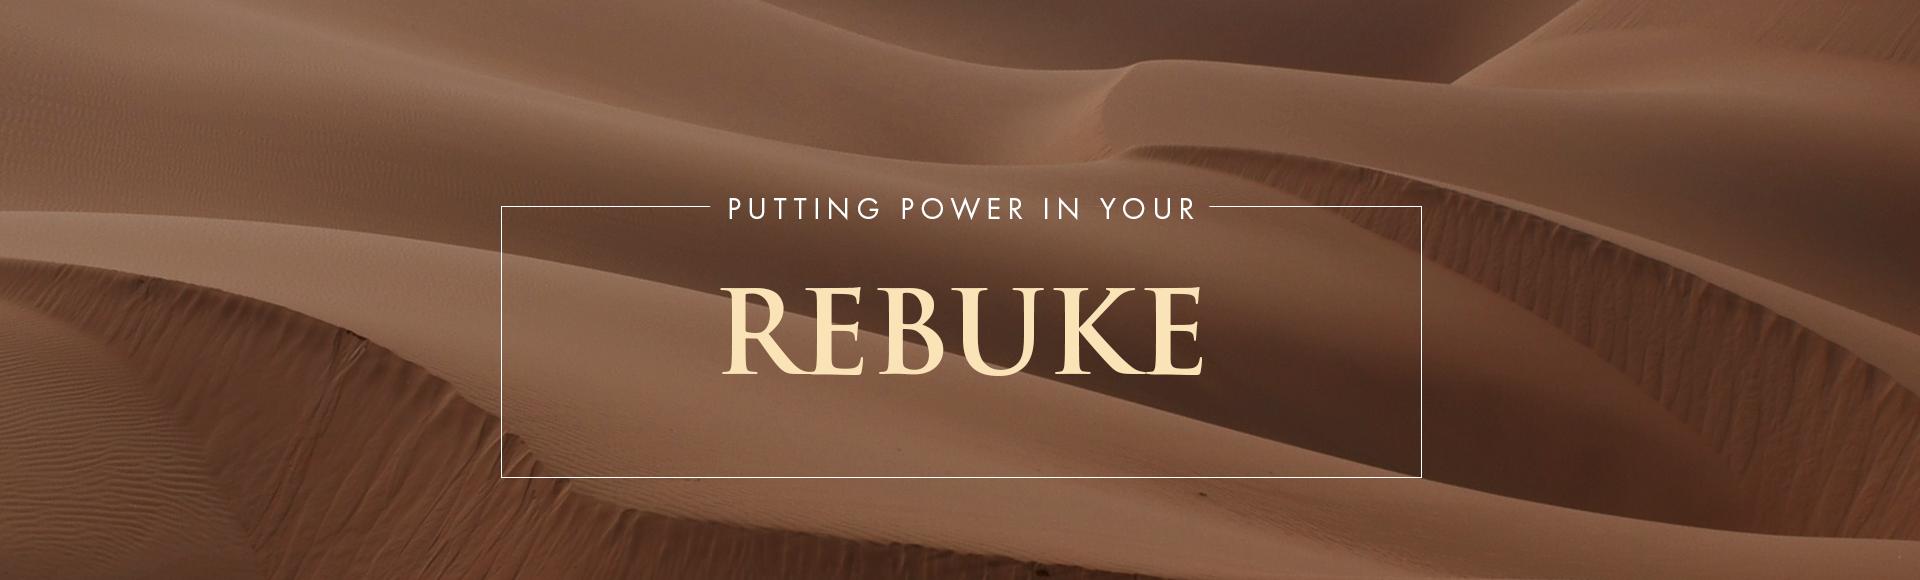 Putting Power in Your Rebuke